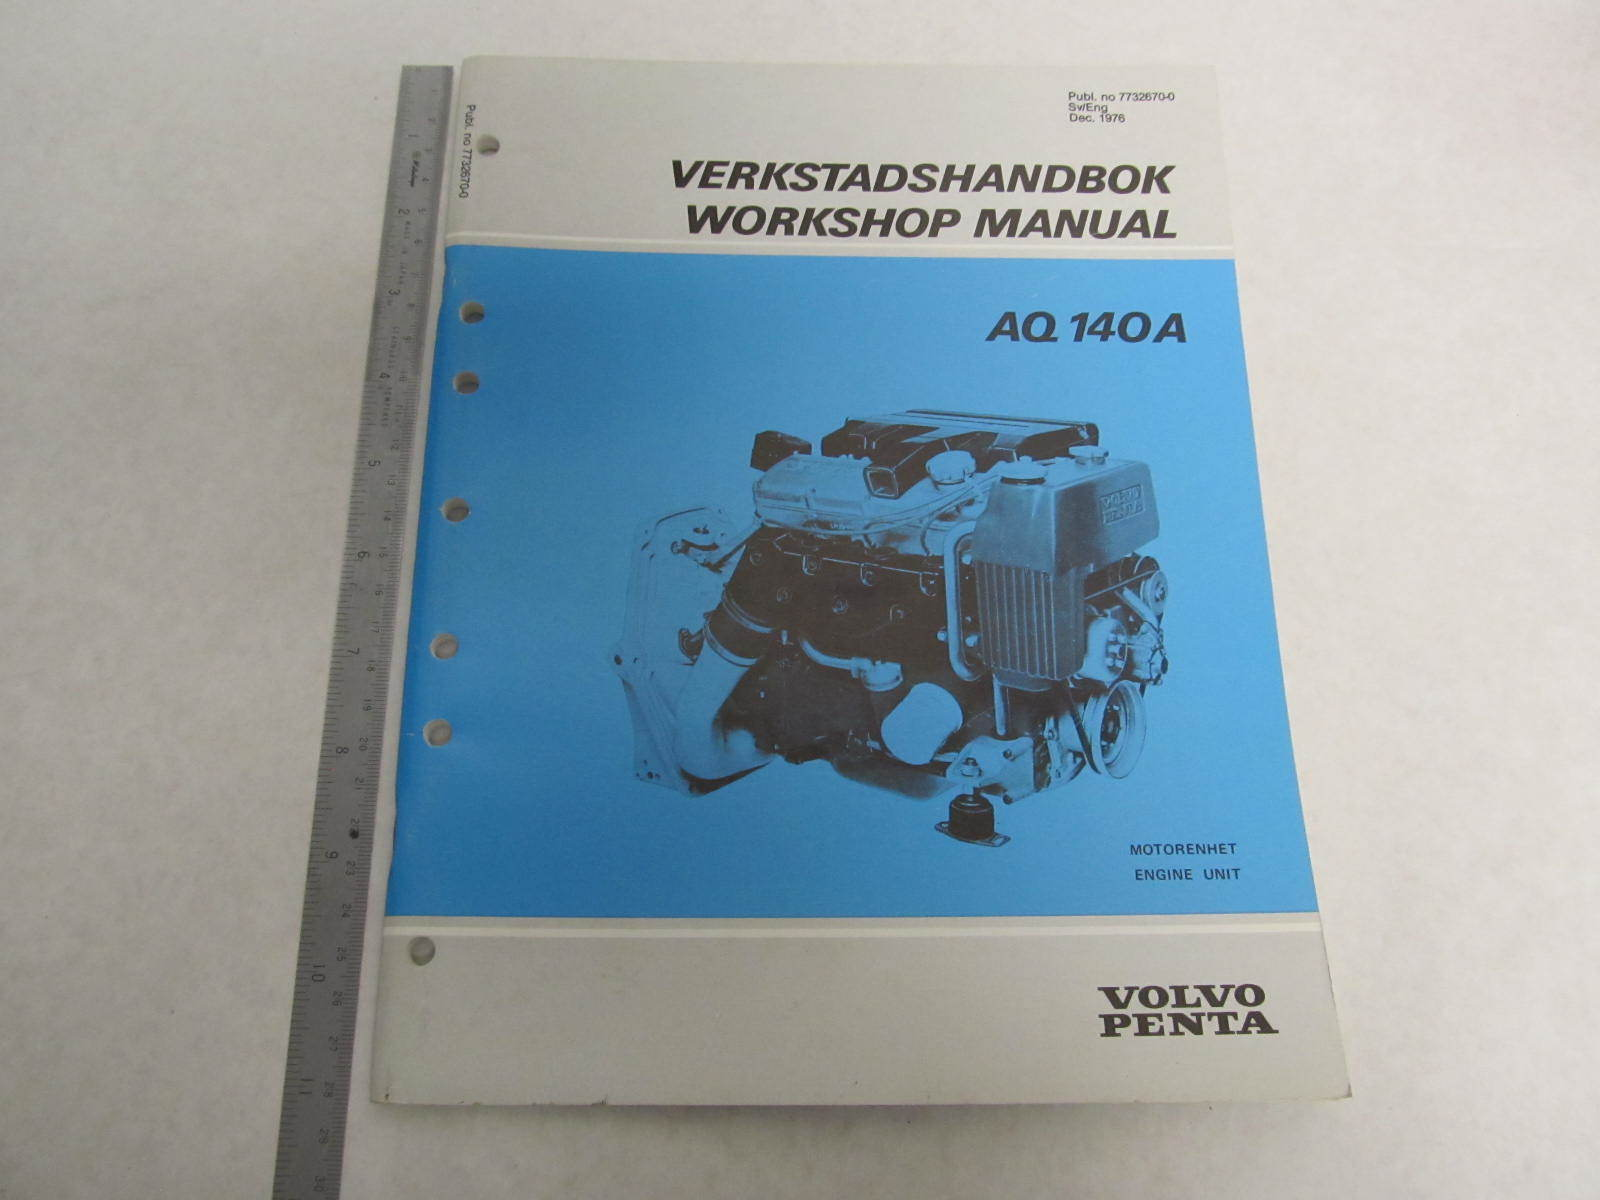 7732670 0 volvo penta aquamatic service workshop manual aq 140a ebay Ford Workshop Manuals Haynes Workshop Manuals